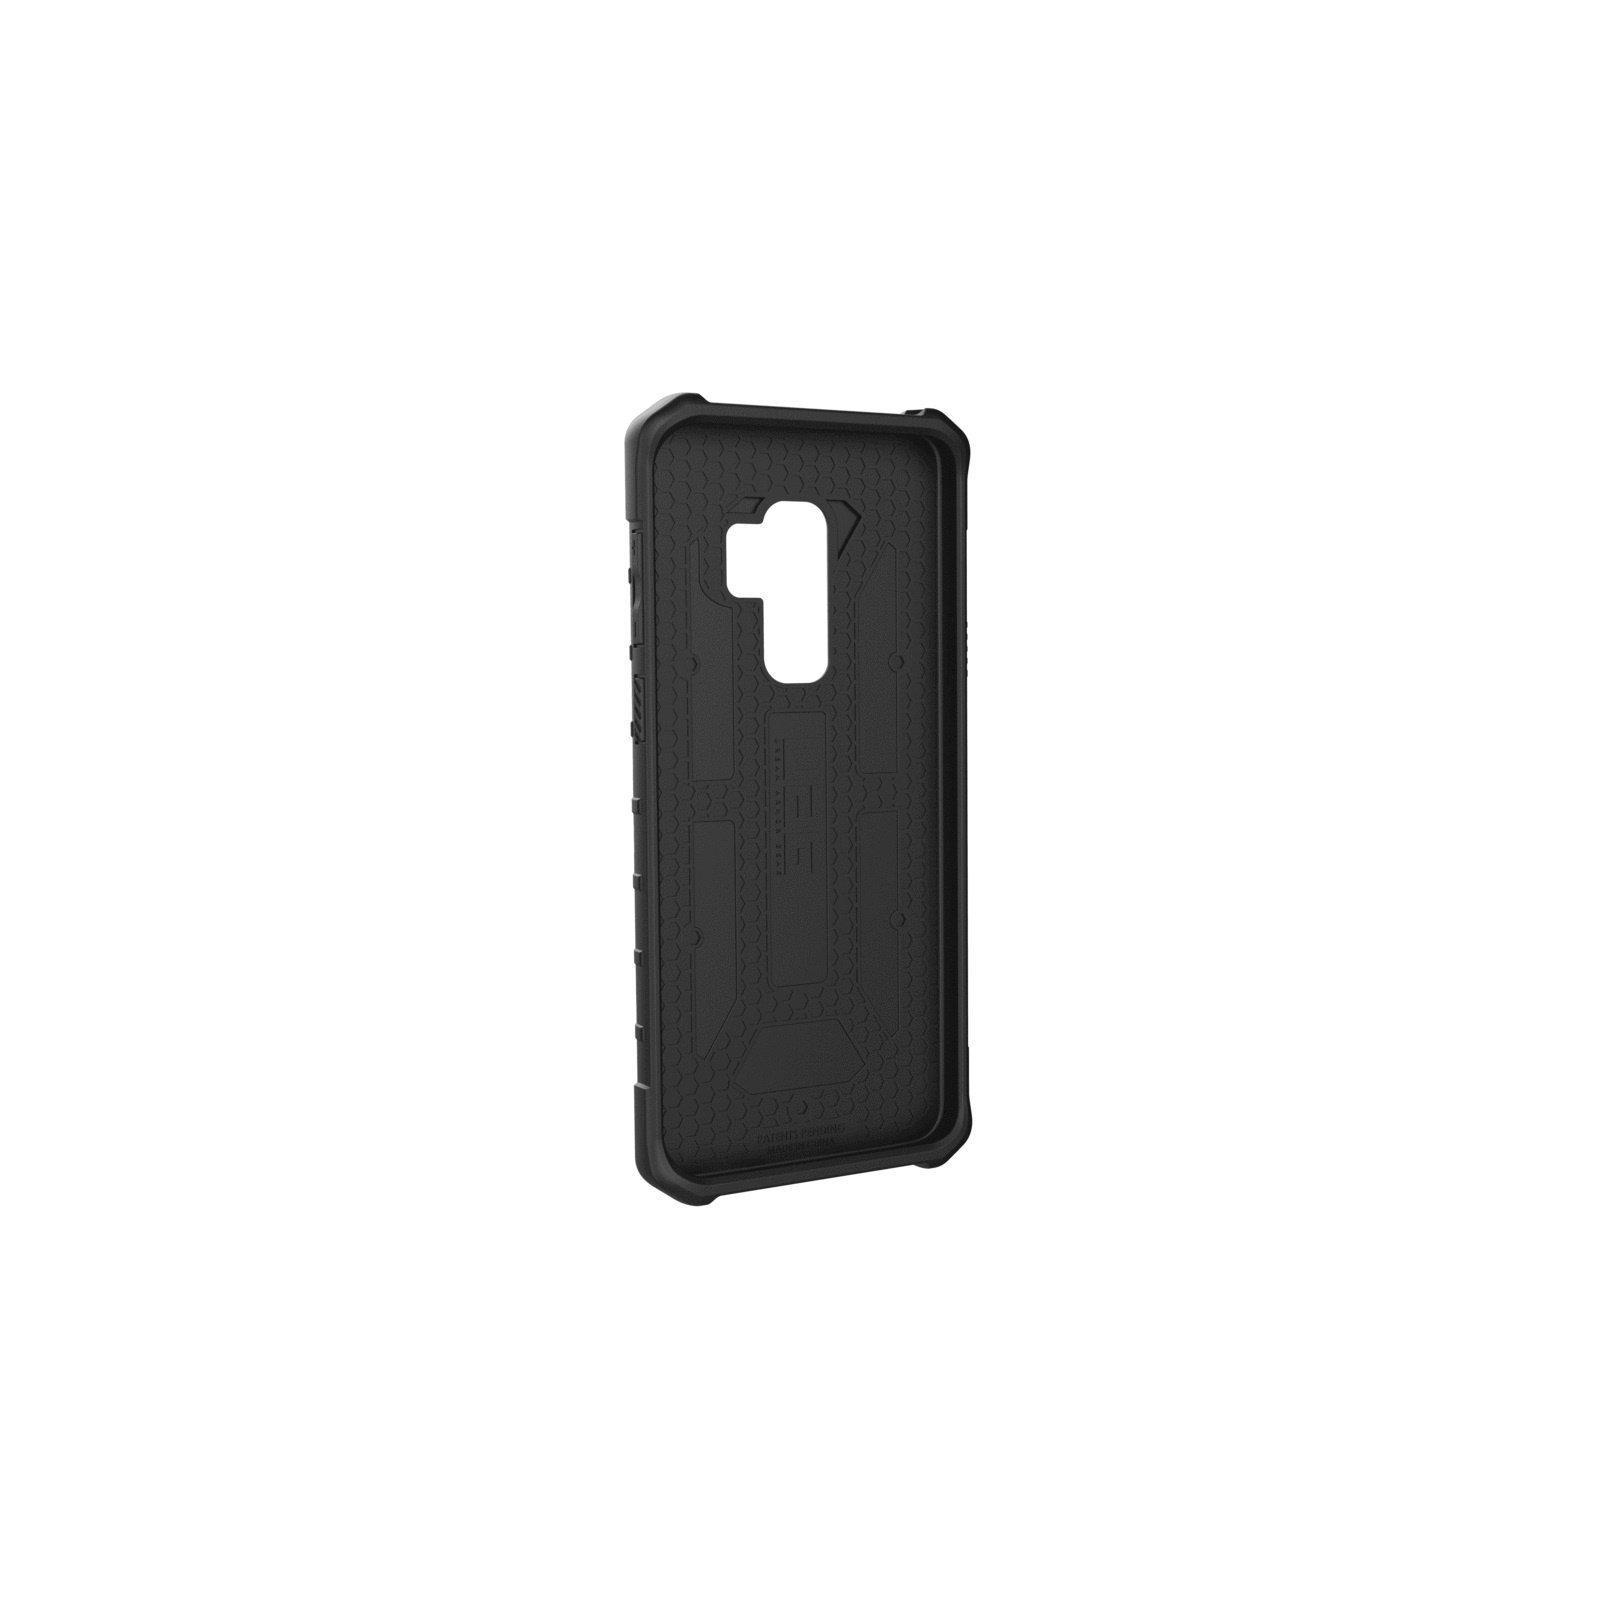 Чехол для моб. телефона Urban Armor Gear Galaxy S9+ Pathfinder Camo Gray/Black (GLXS9PLS-A-BC) изображение 4